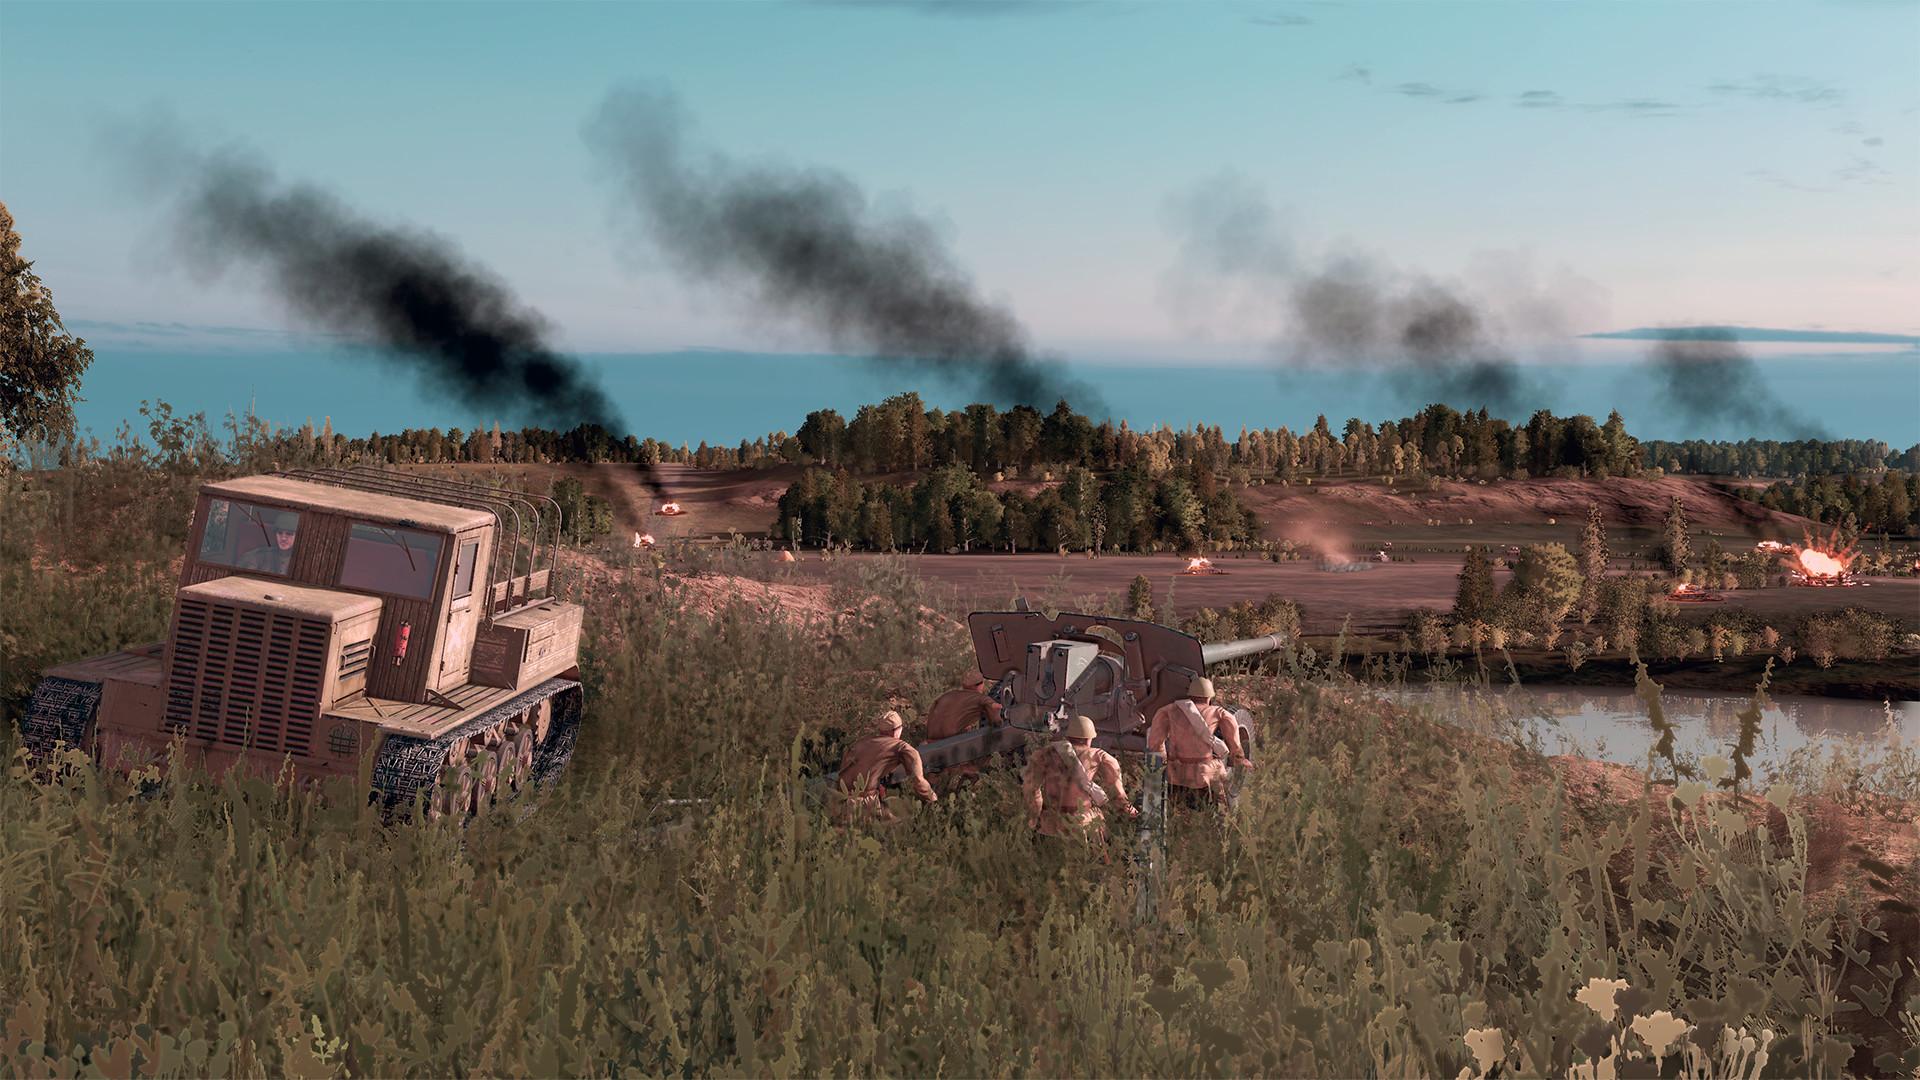 steel-division-2-pc-screenshot-01